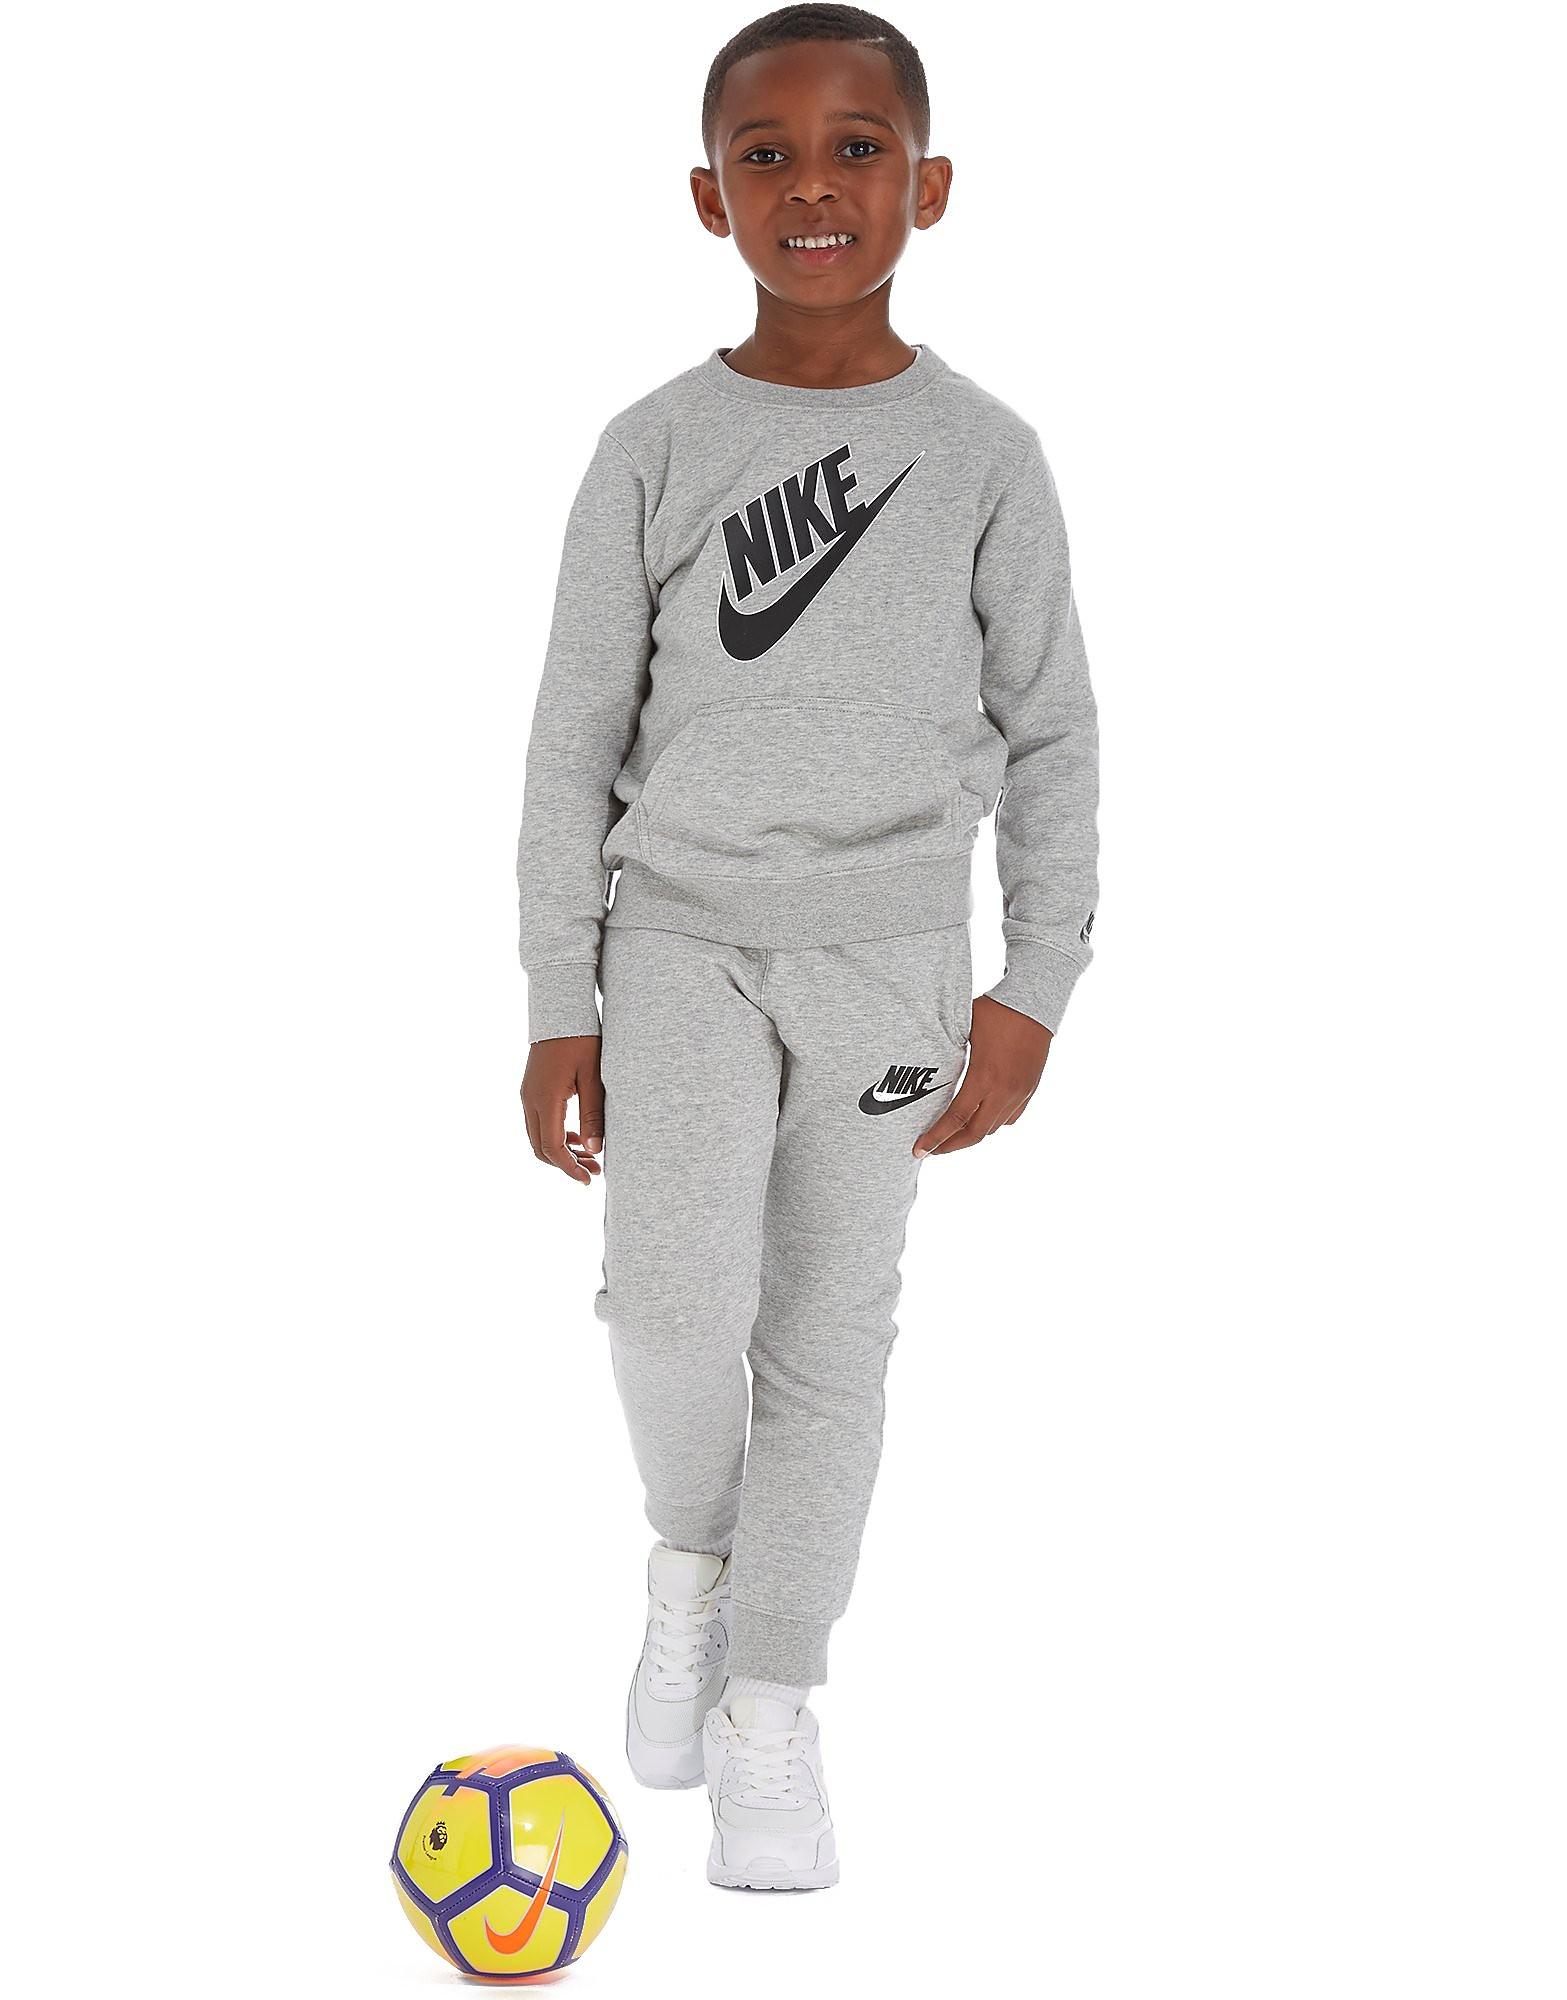 Nike Futura Crew Tracksuit Children